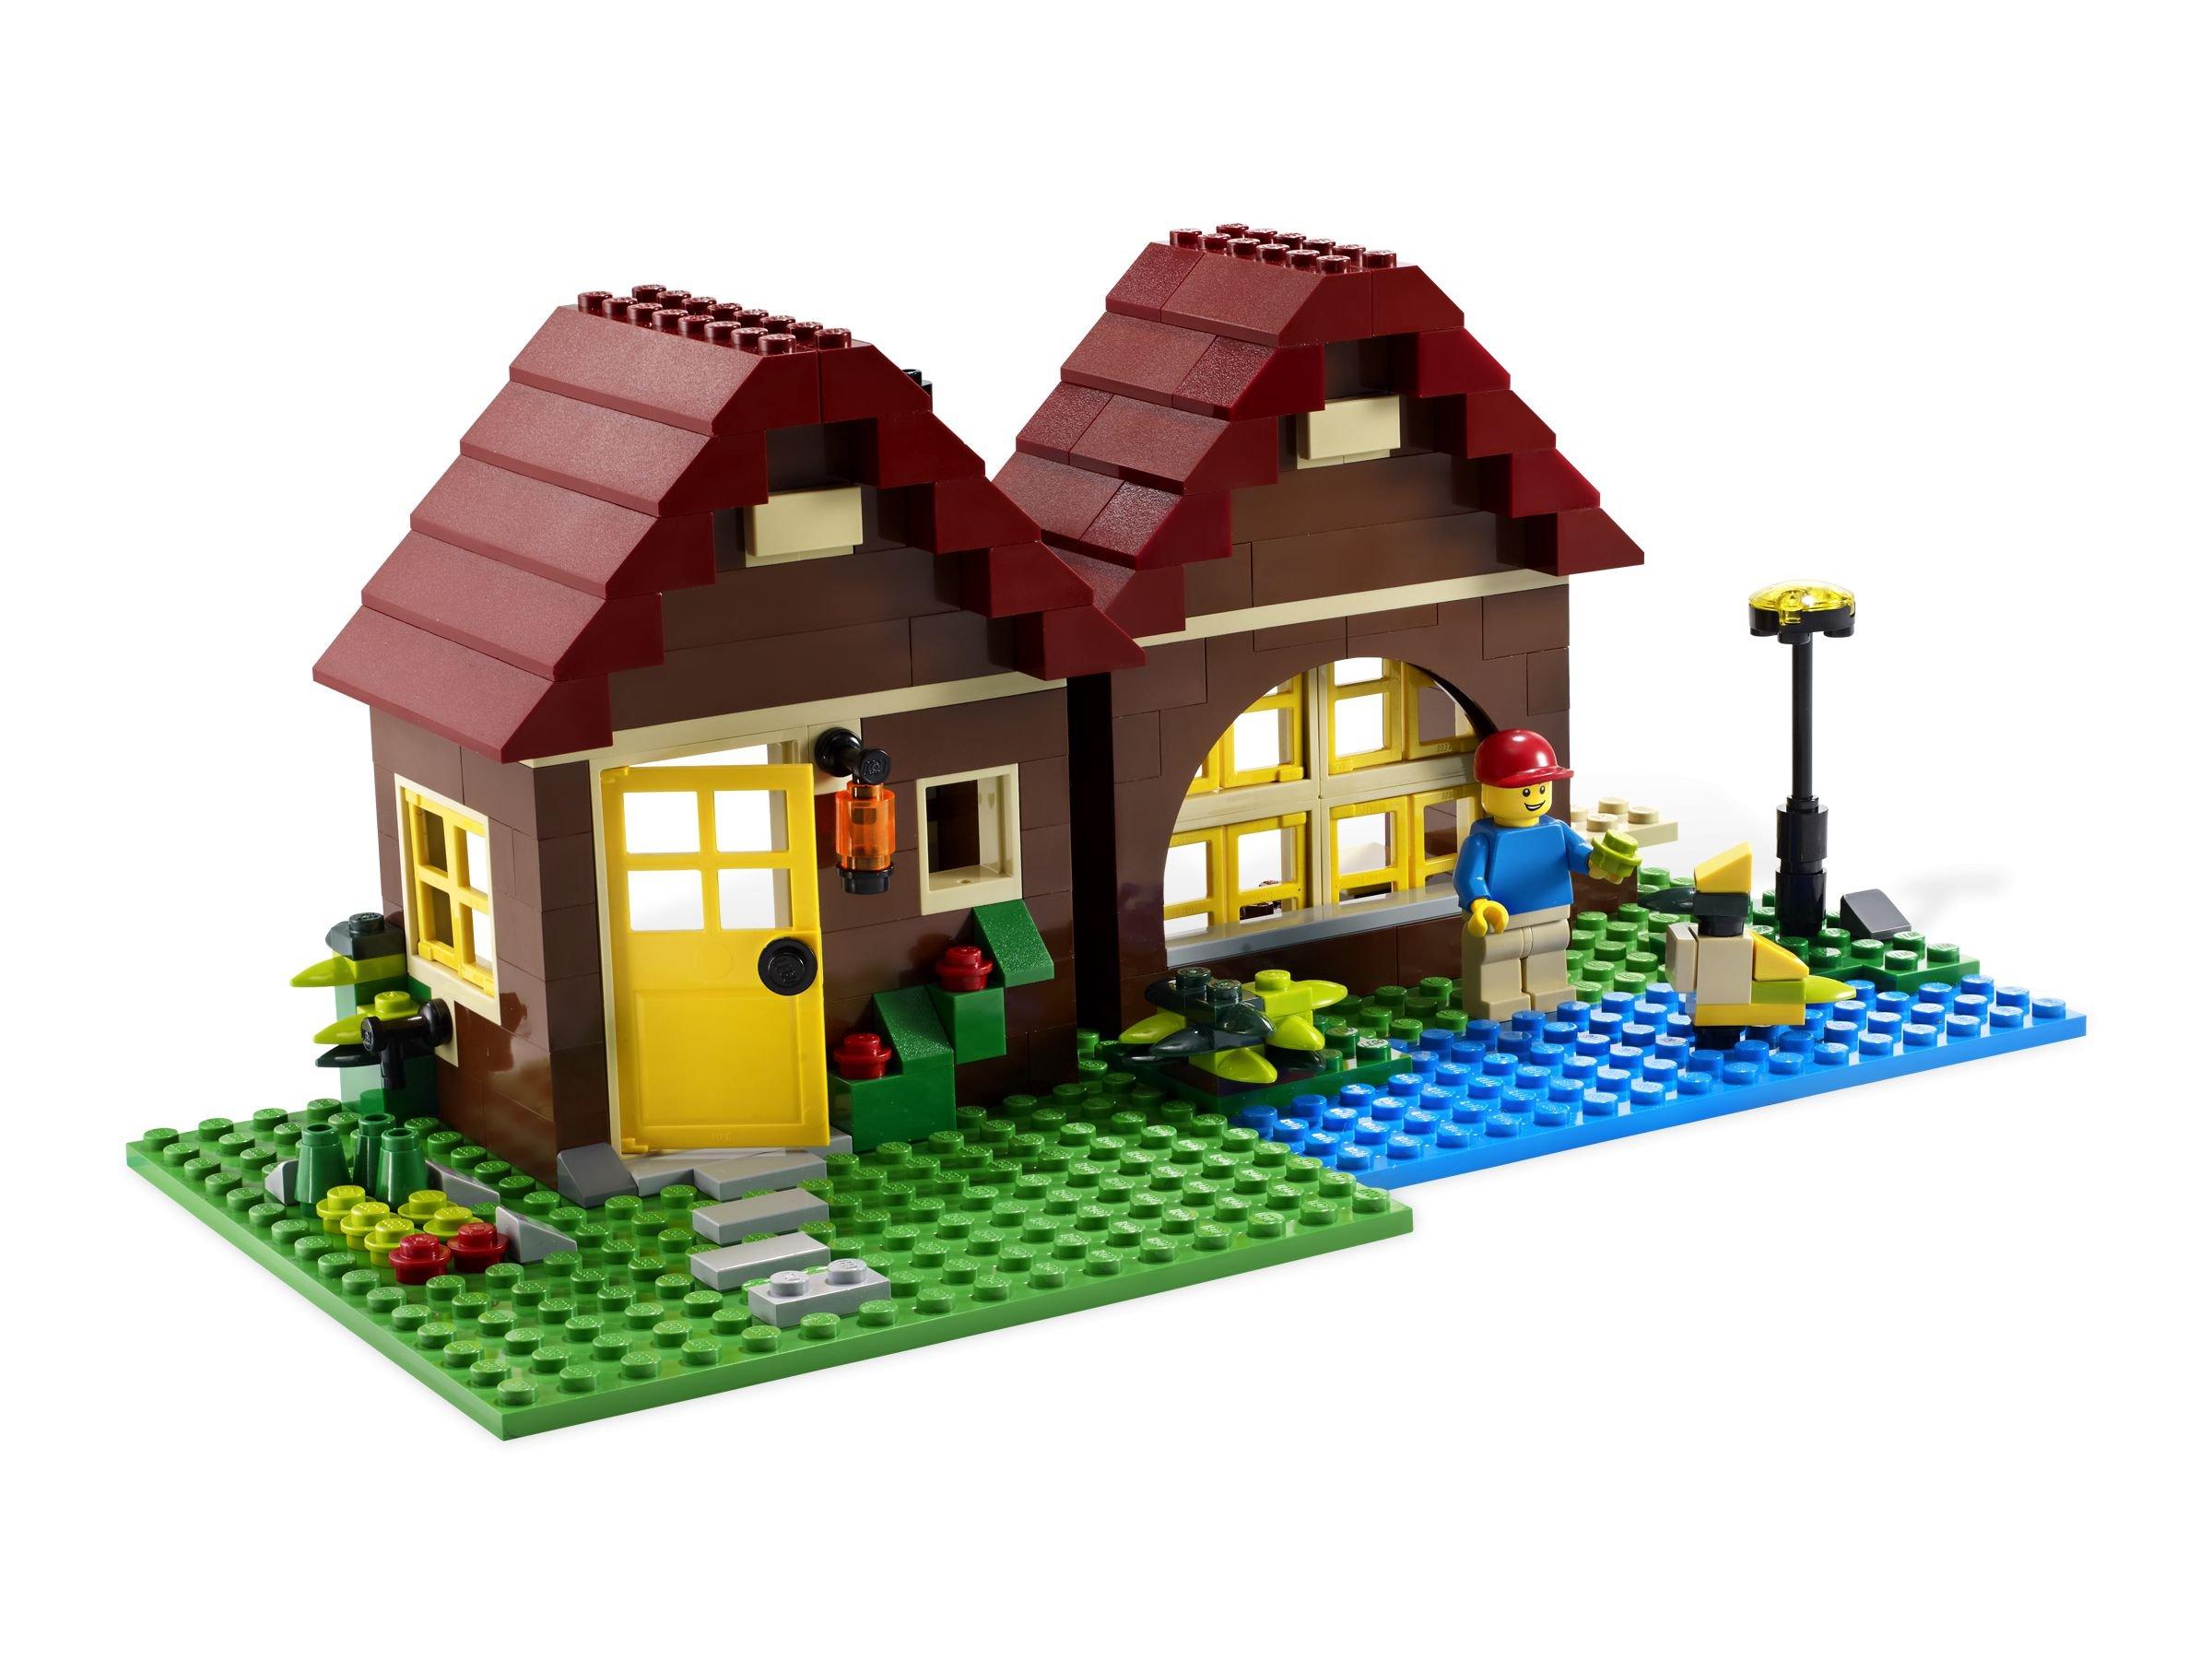 lego creator 5766 blockhaus brickmerge preisvergleich. Black Bedroom Furniture Sets. Home Design Ideas